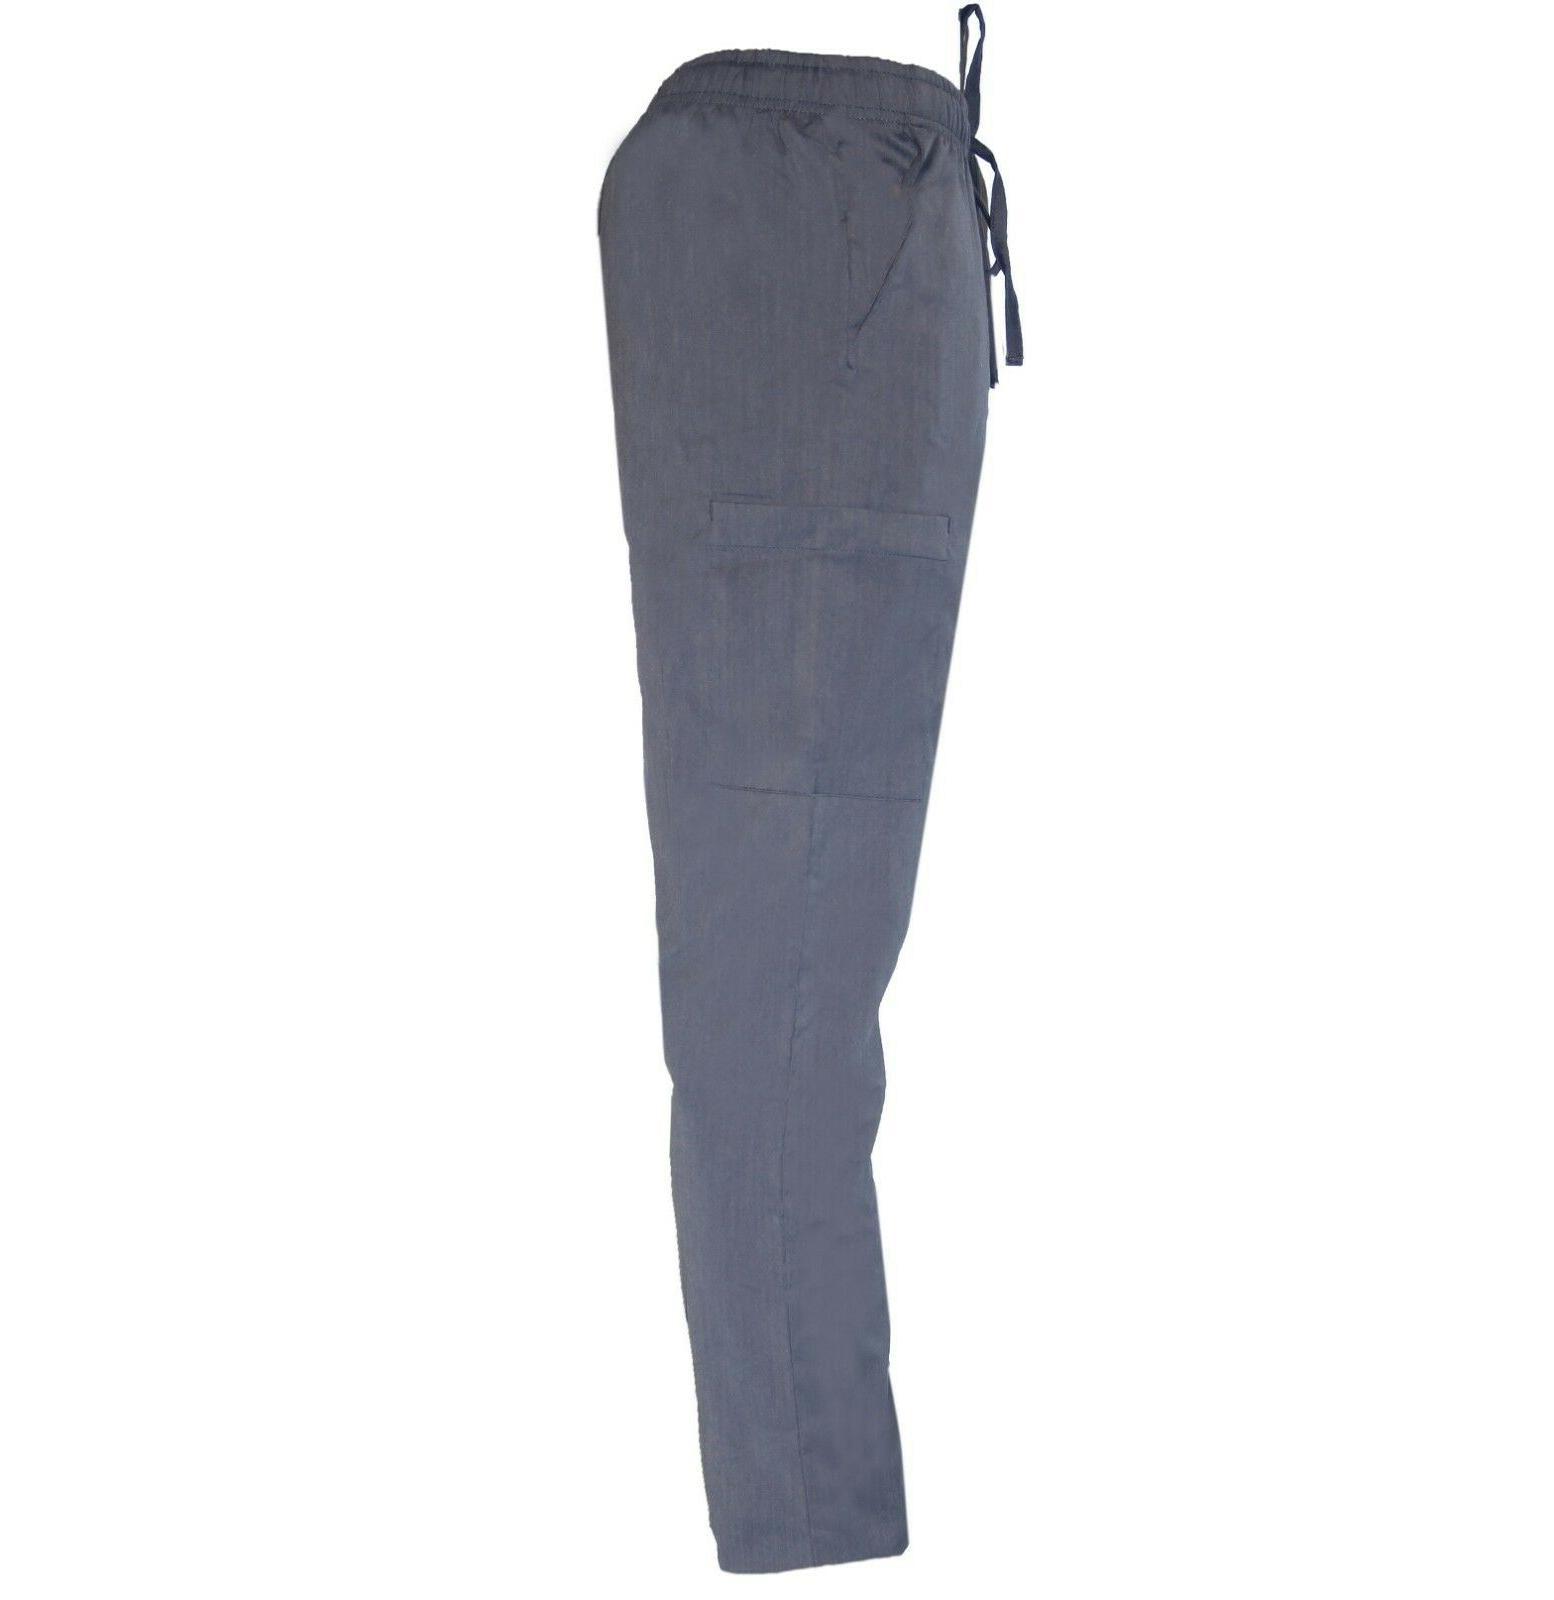 Womens STRETCH Nursing Uniform Scrub Top Pant S M L XL